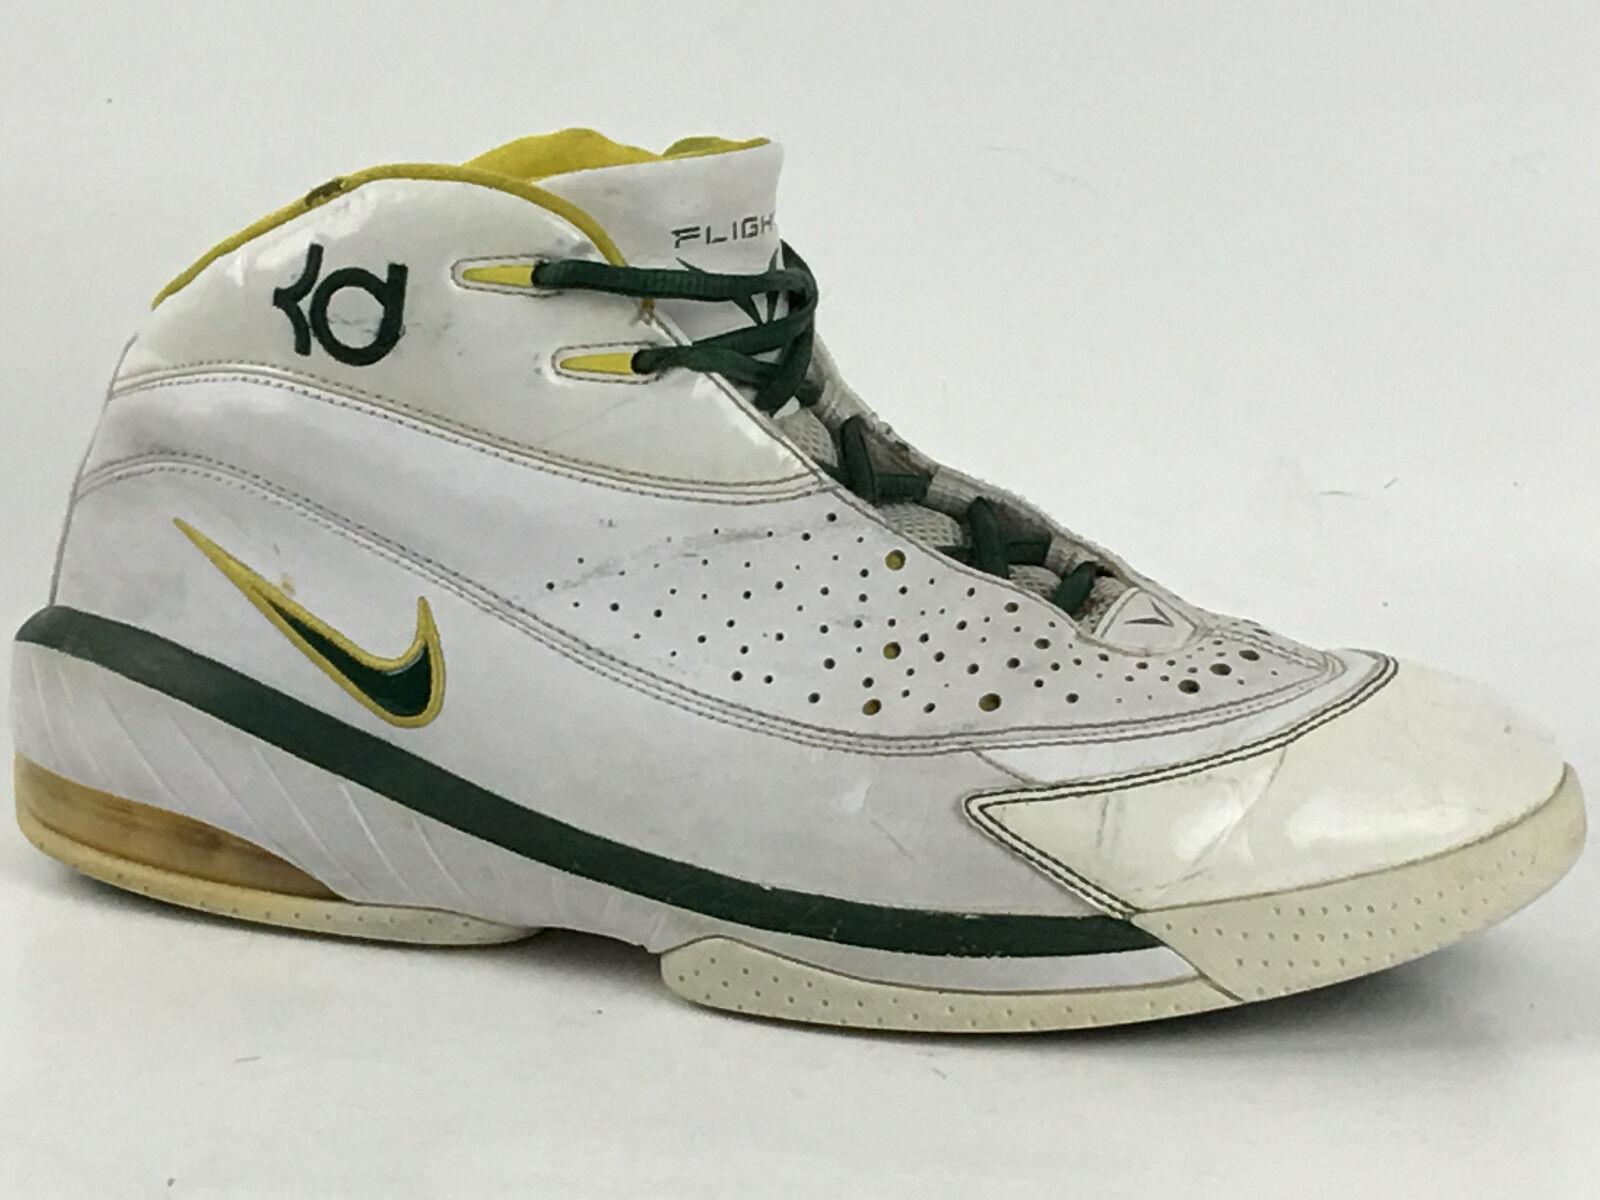 Vintage Kevin Durant Nike KD 1 White/Grn 318111-131 Size US.10.5 UK. 9.5 EU.44.5